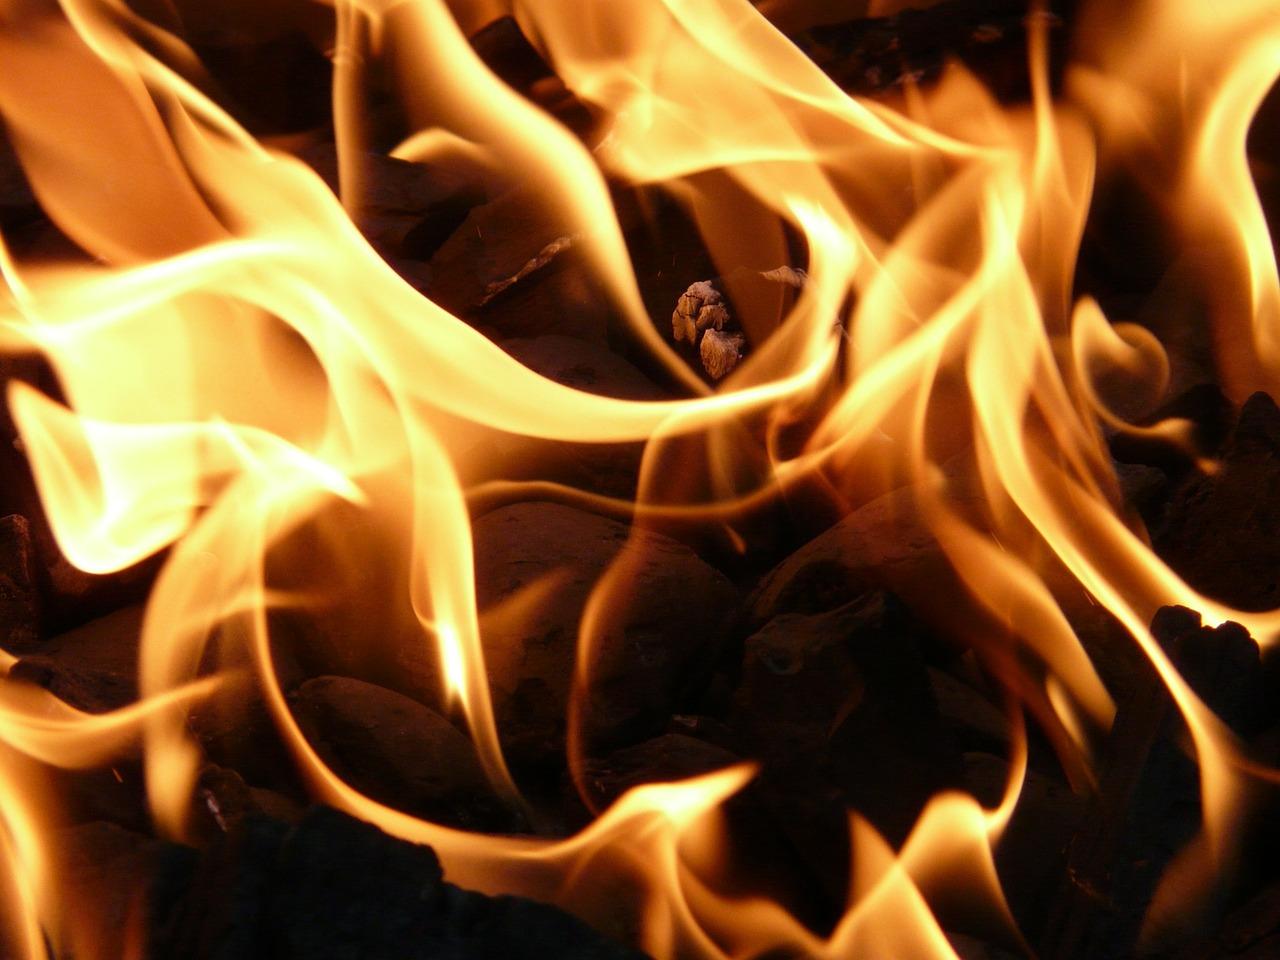 Tarif cheminée a foyer ouvert  à Soorts-Hossegor